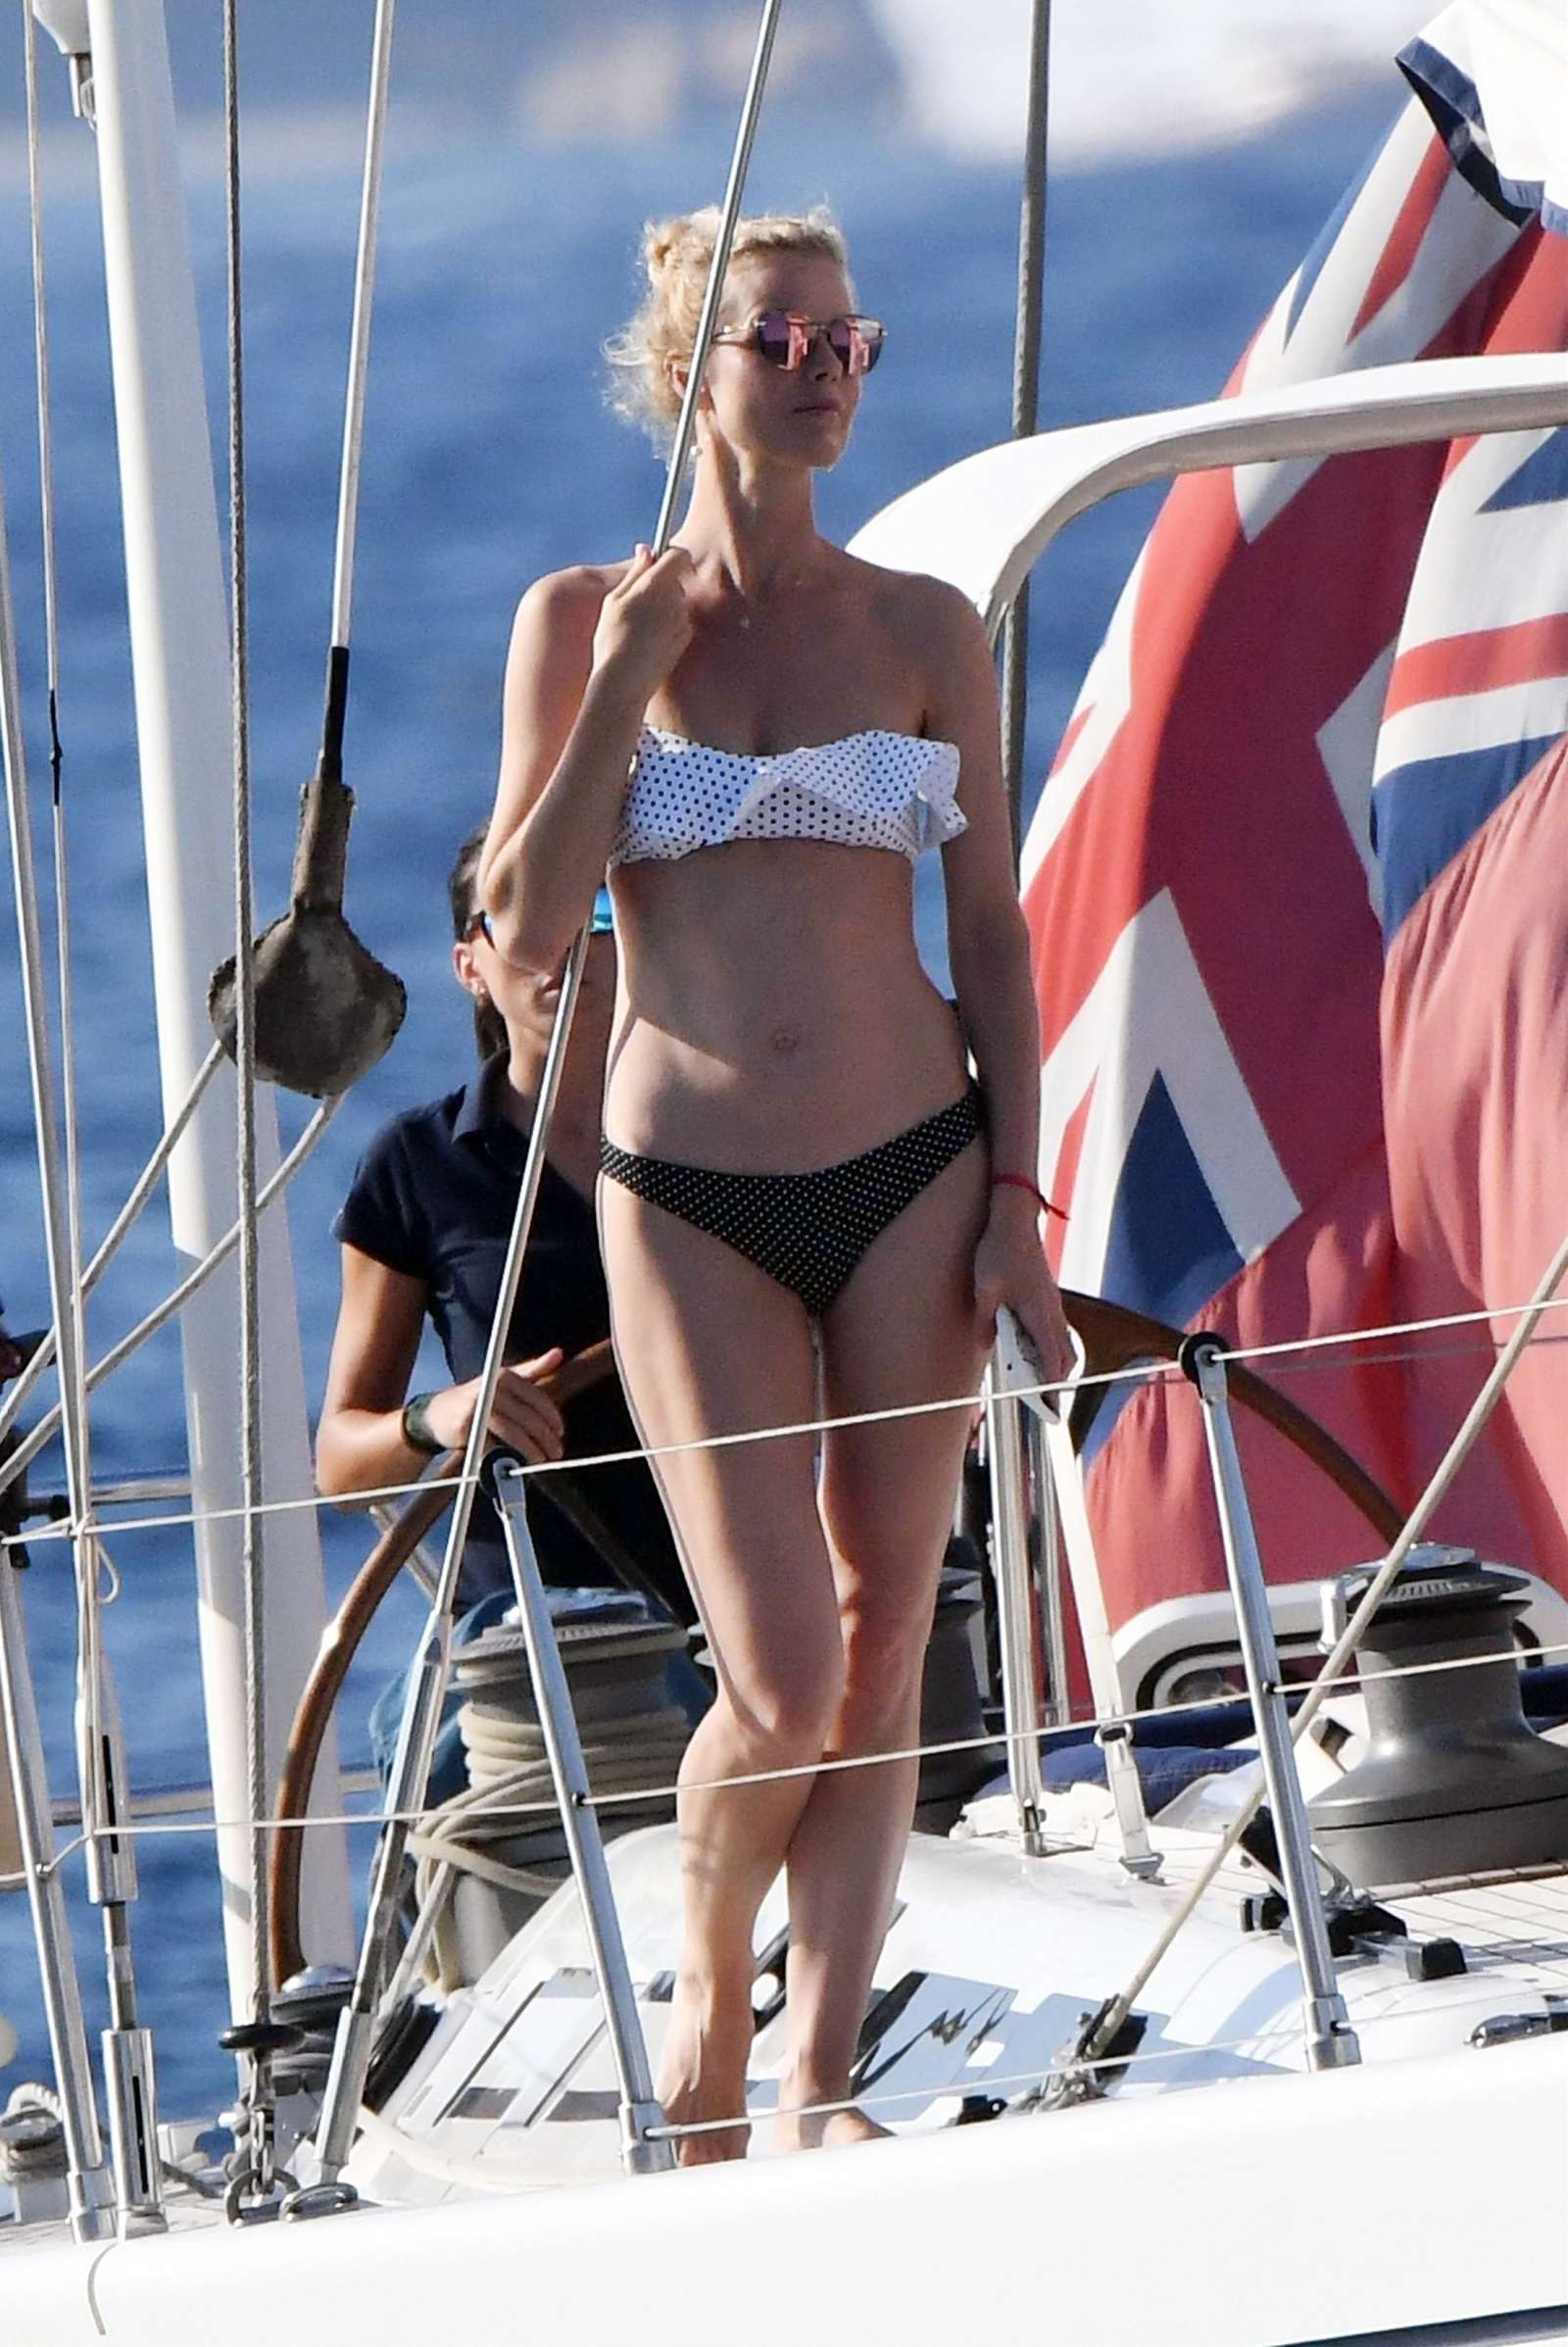 images Eva herzigova in bikini porto rotondo italy